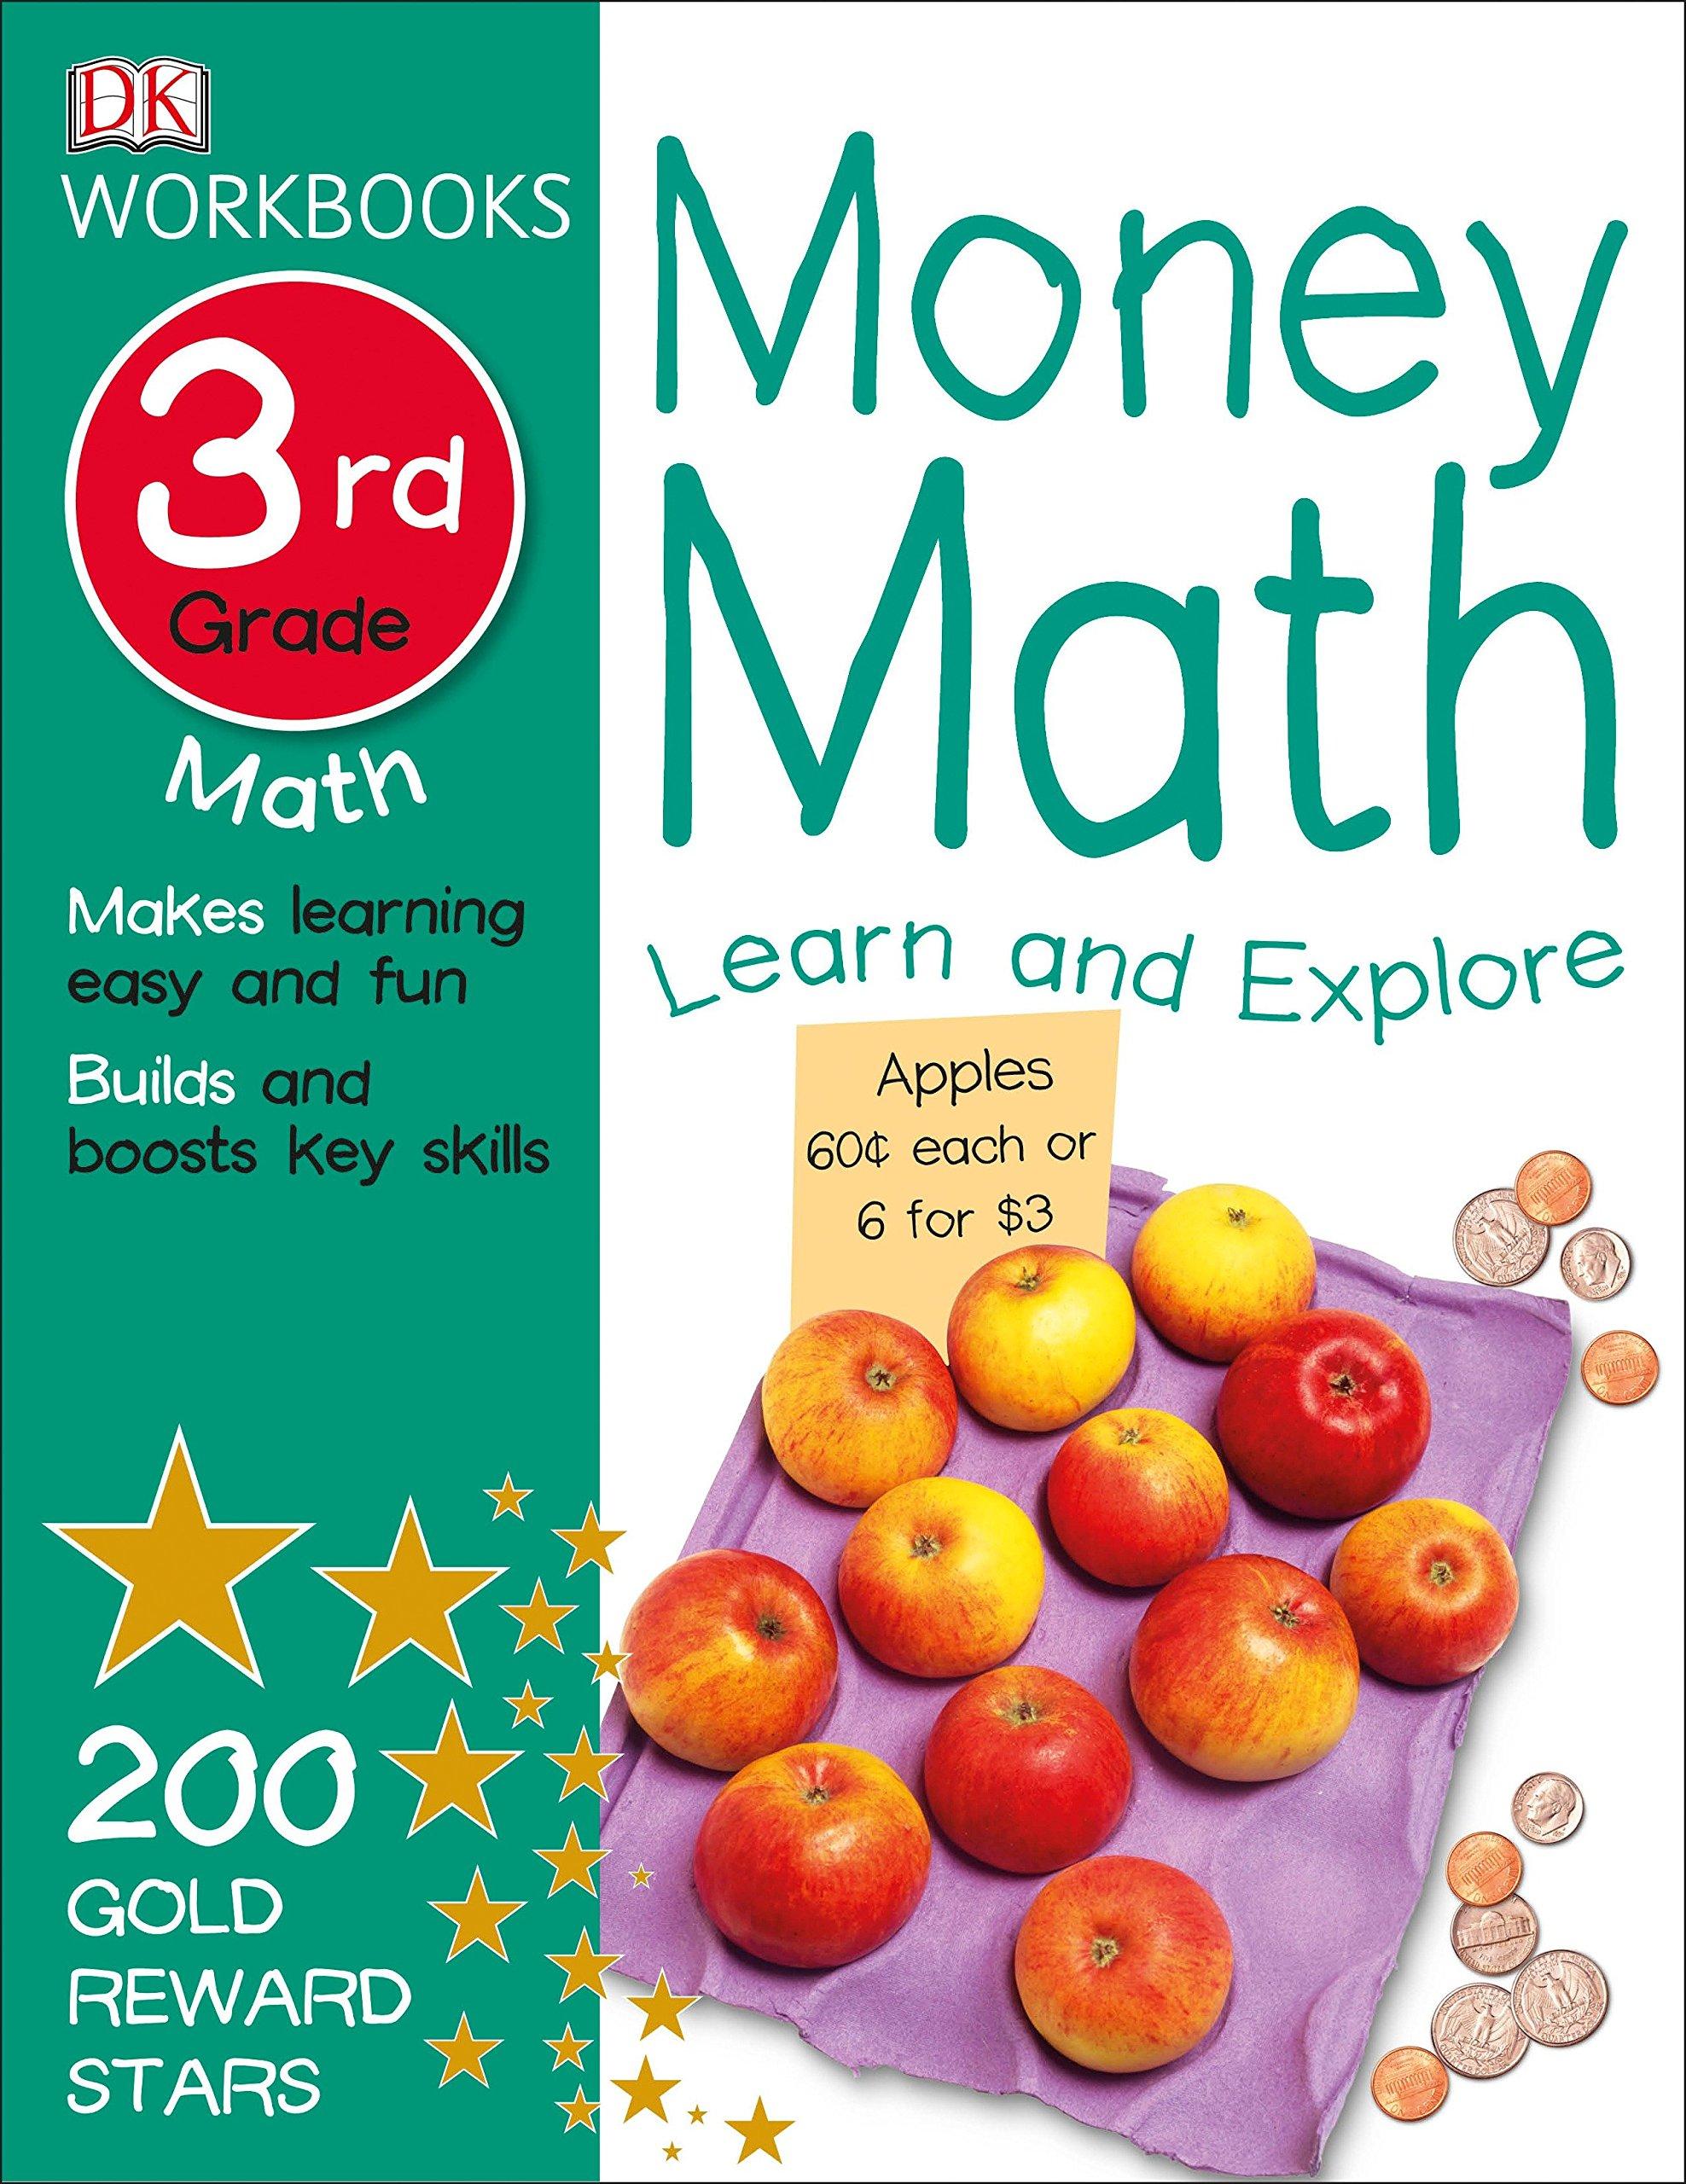 DK Workbooks: Money Math, Third Grade: DK: 9781465451217: Amazon.com ...